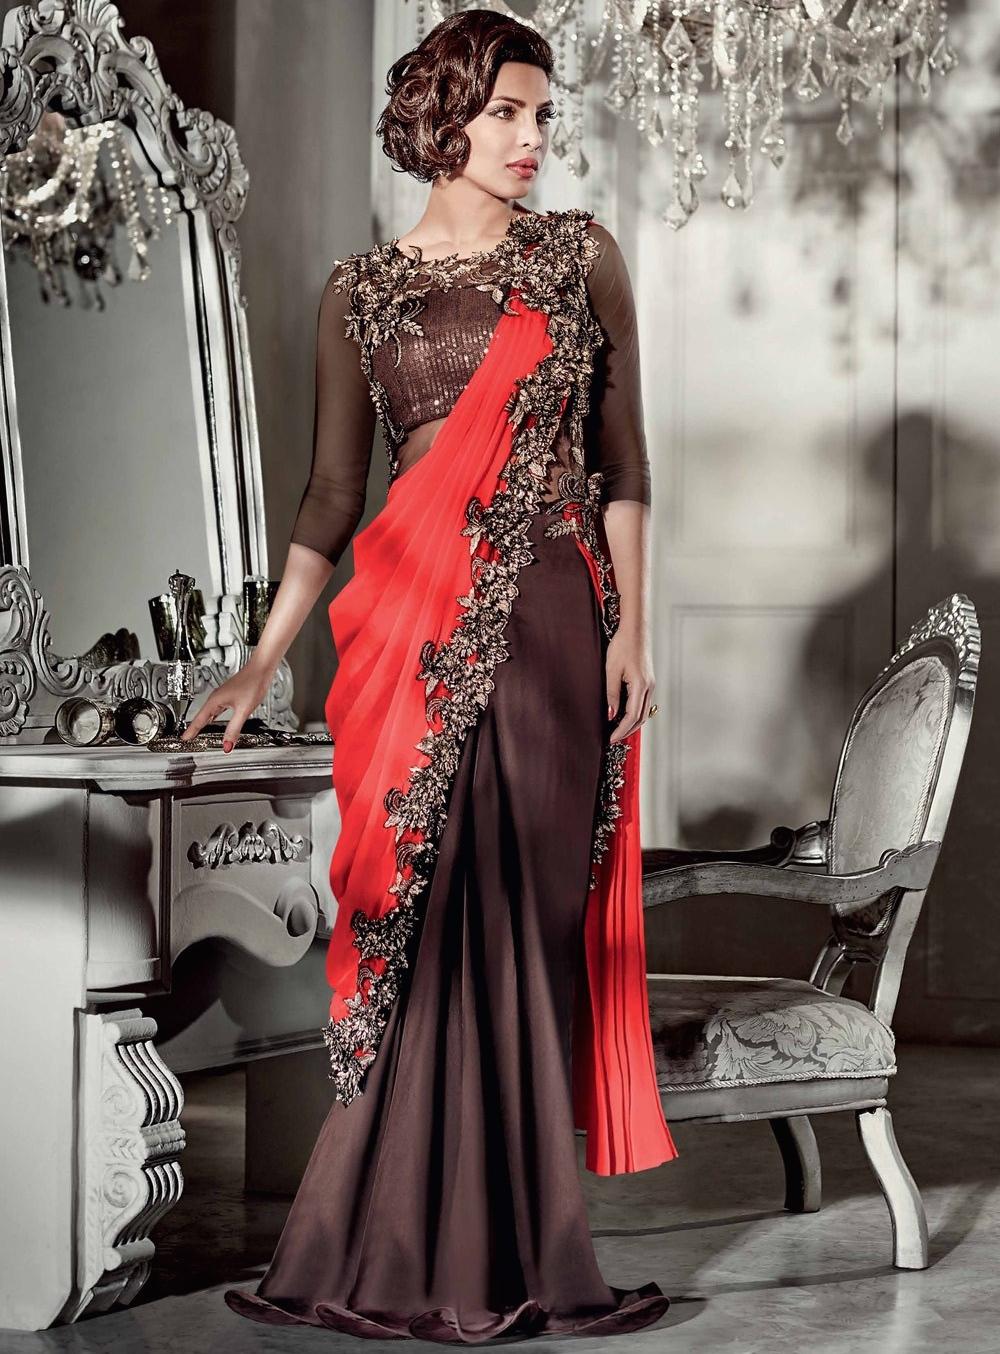 BuyPriyanka Chopra Brown And Plum Color Saree Type Wedding Gown In